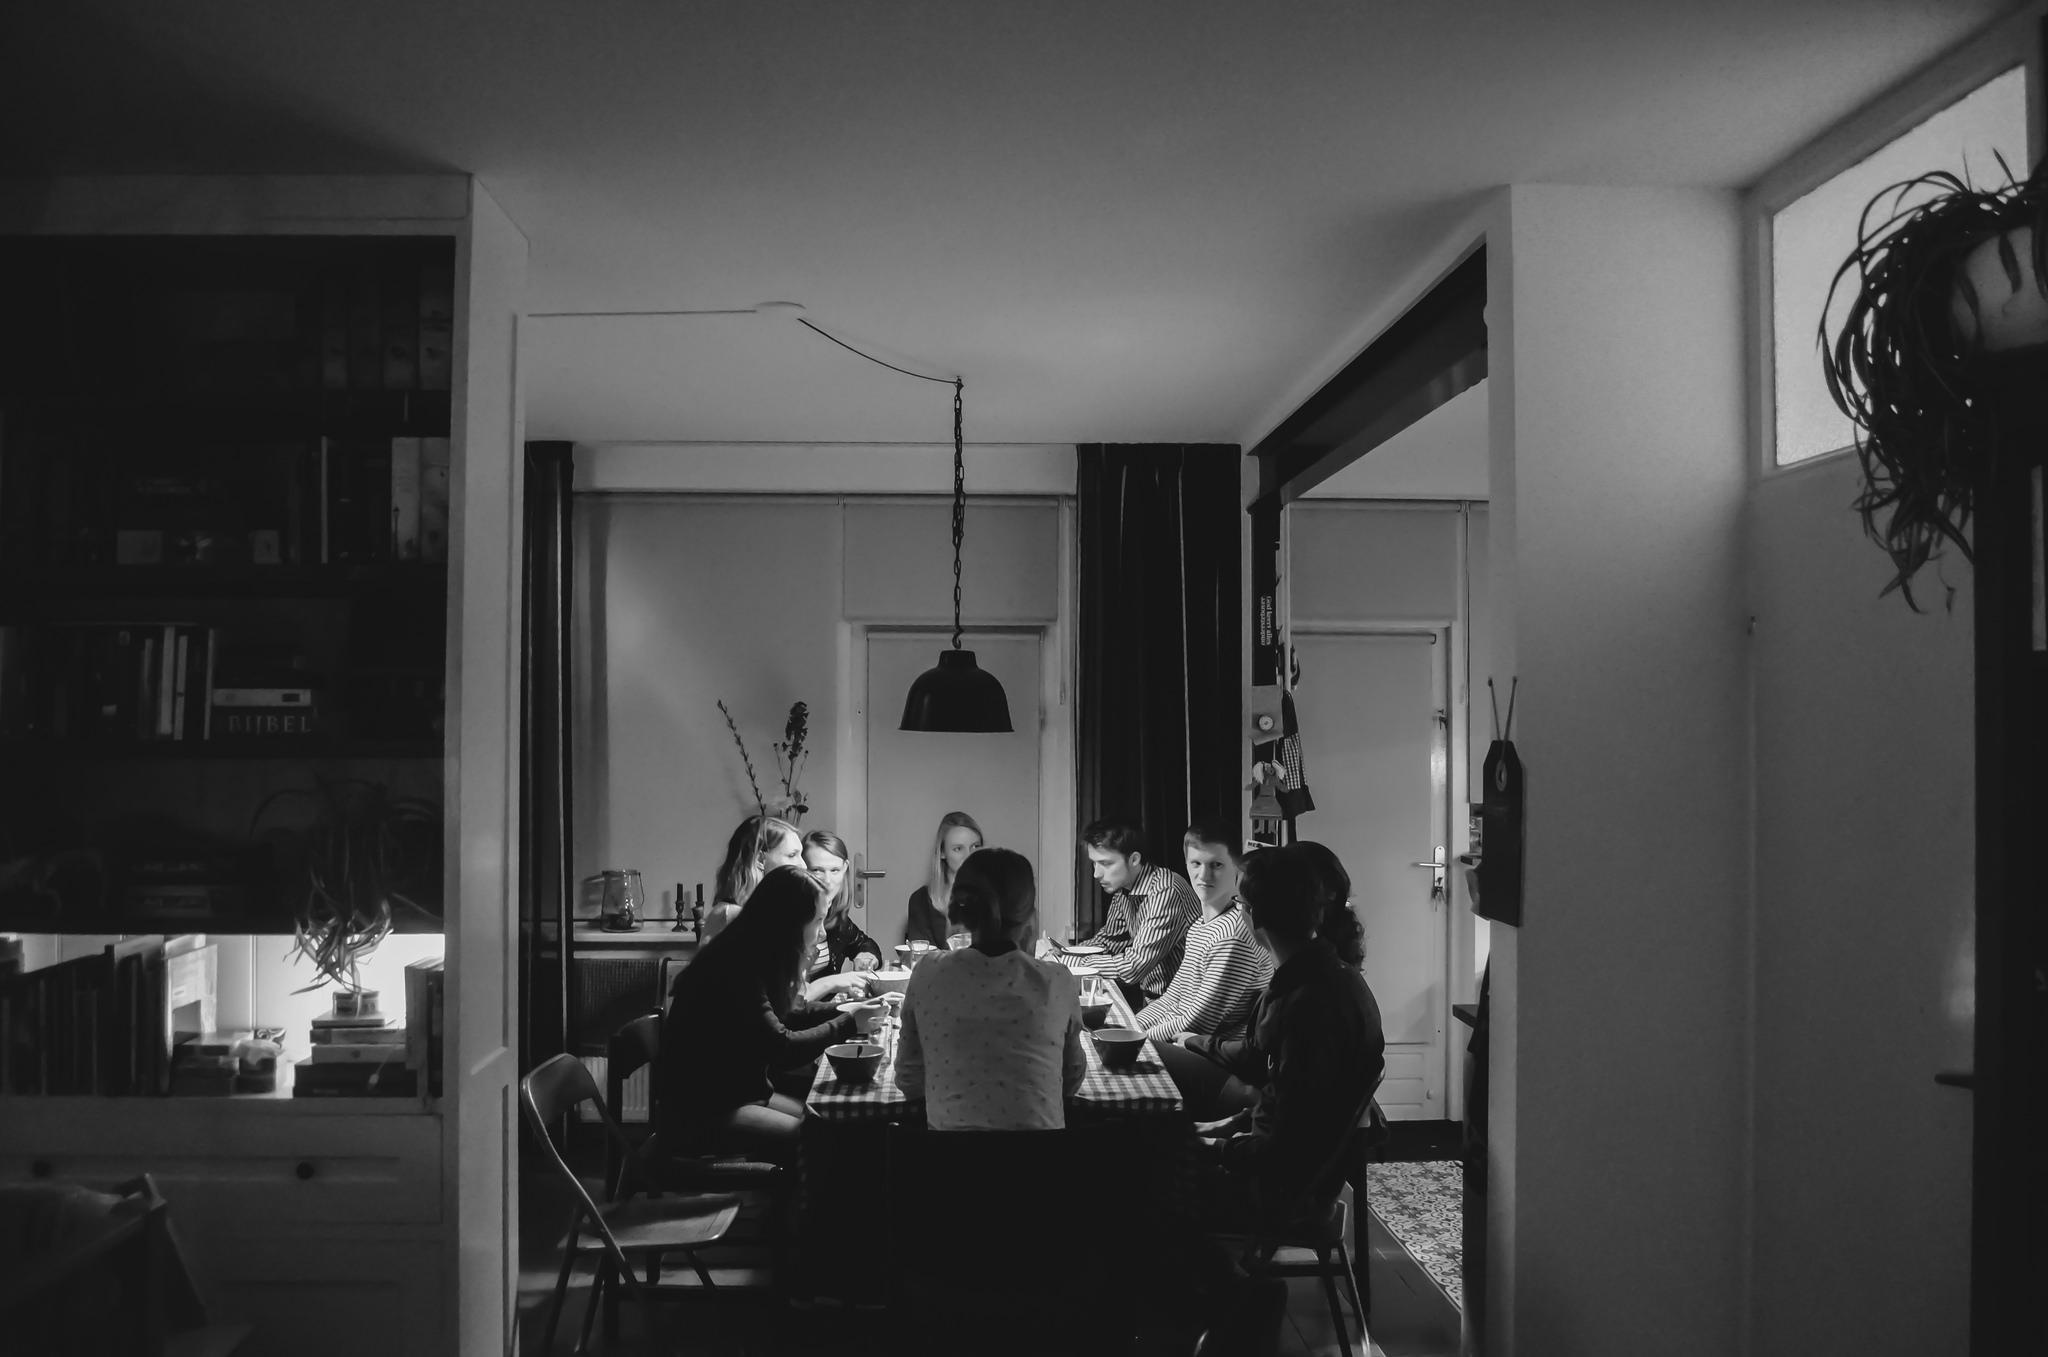 Terugblik – Toerustingsavond kringleiders van huiskringen